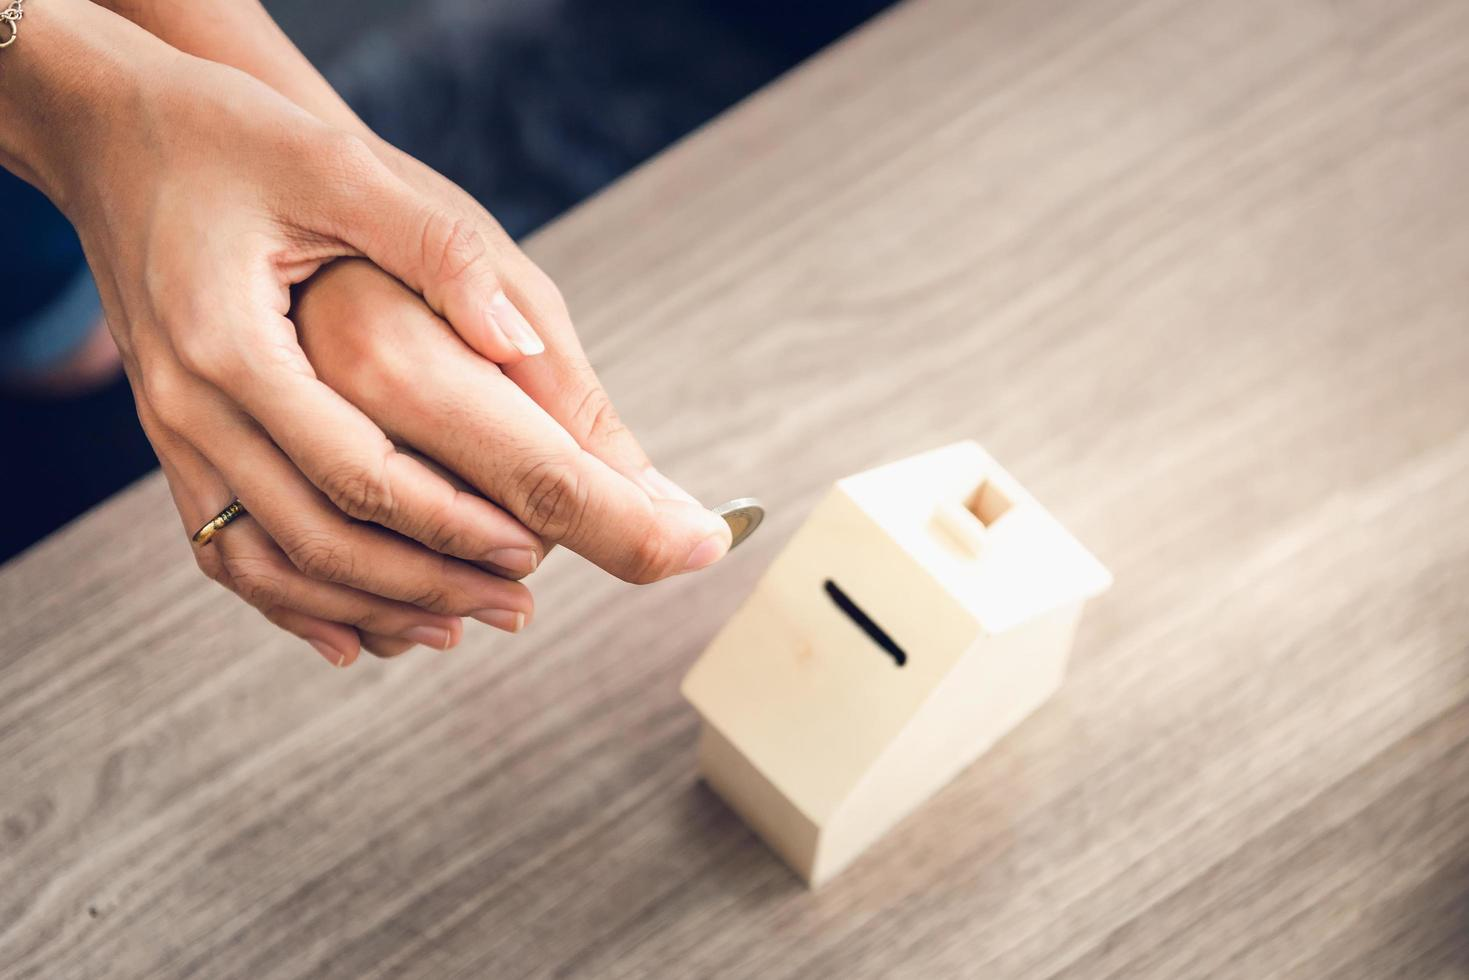 Couples hands depositing a coin into bank  photo